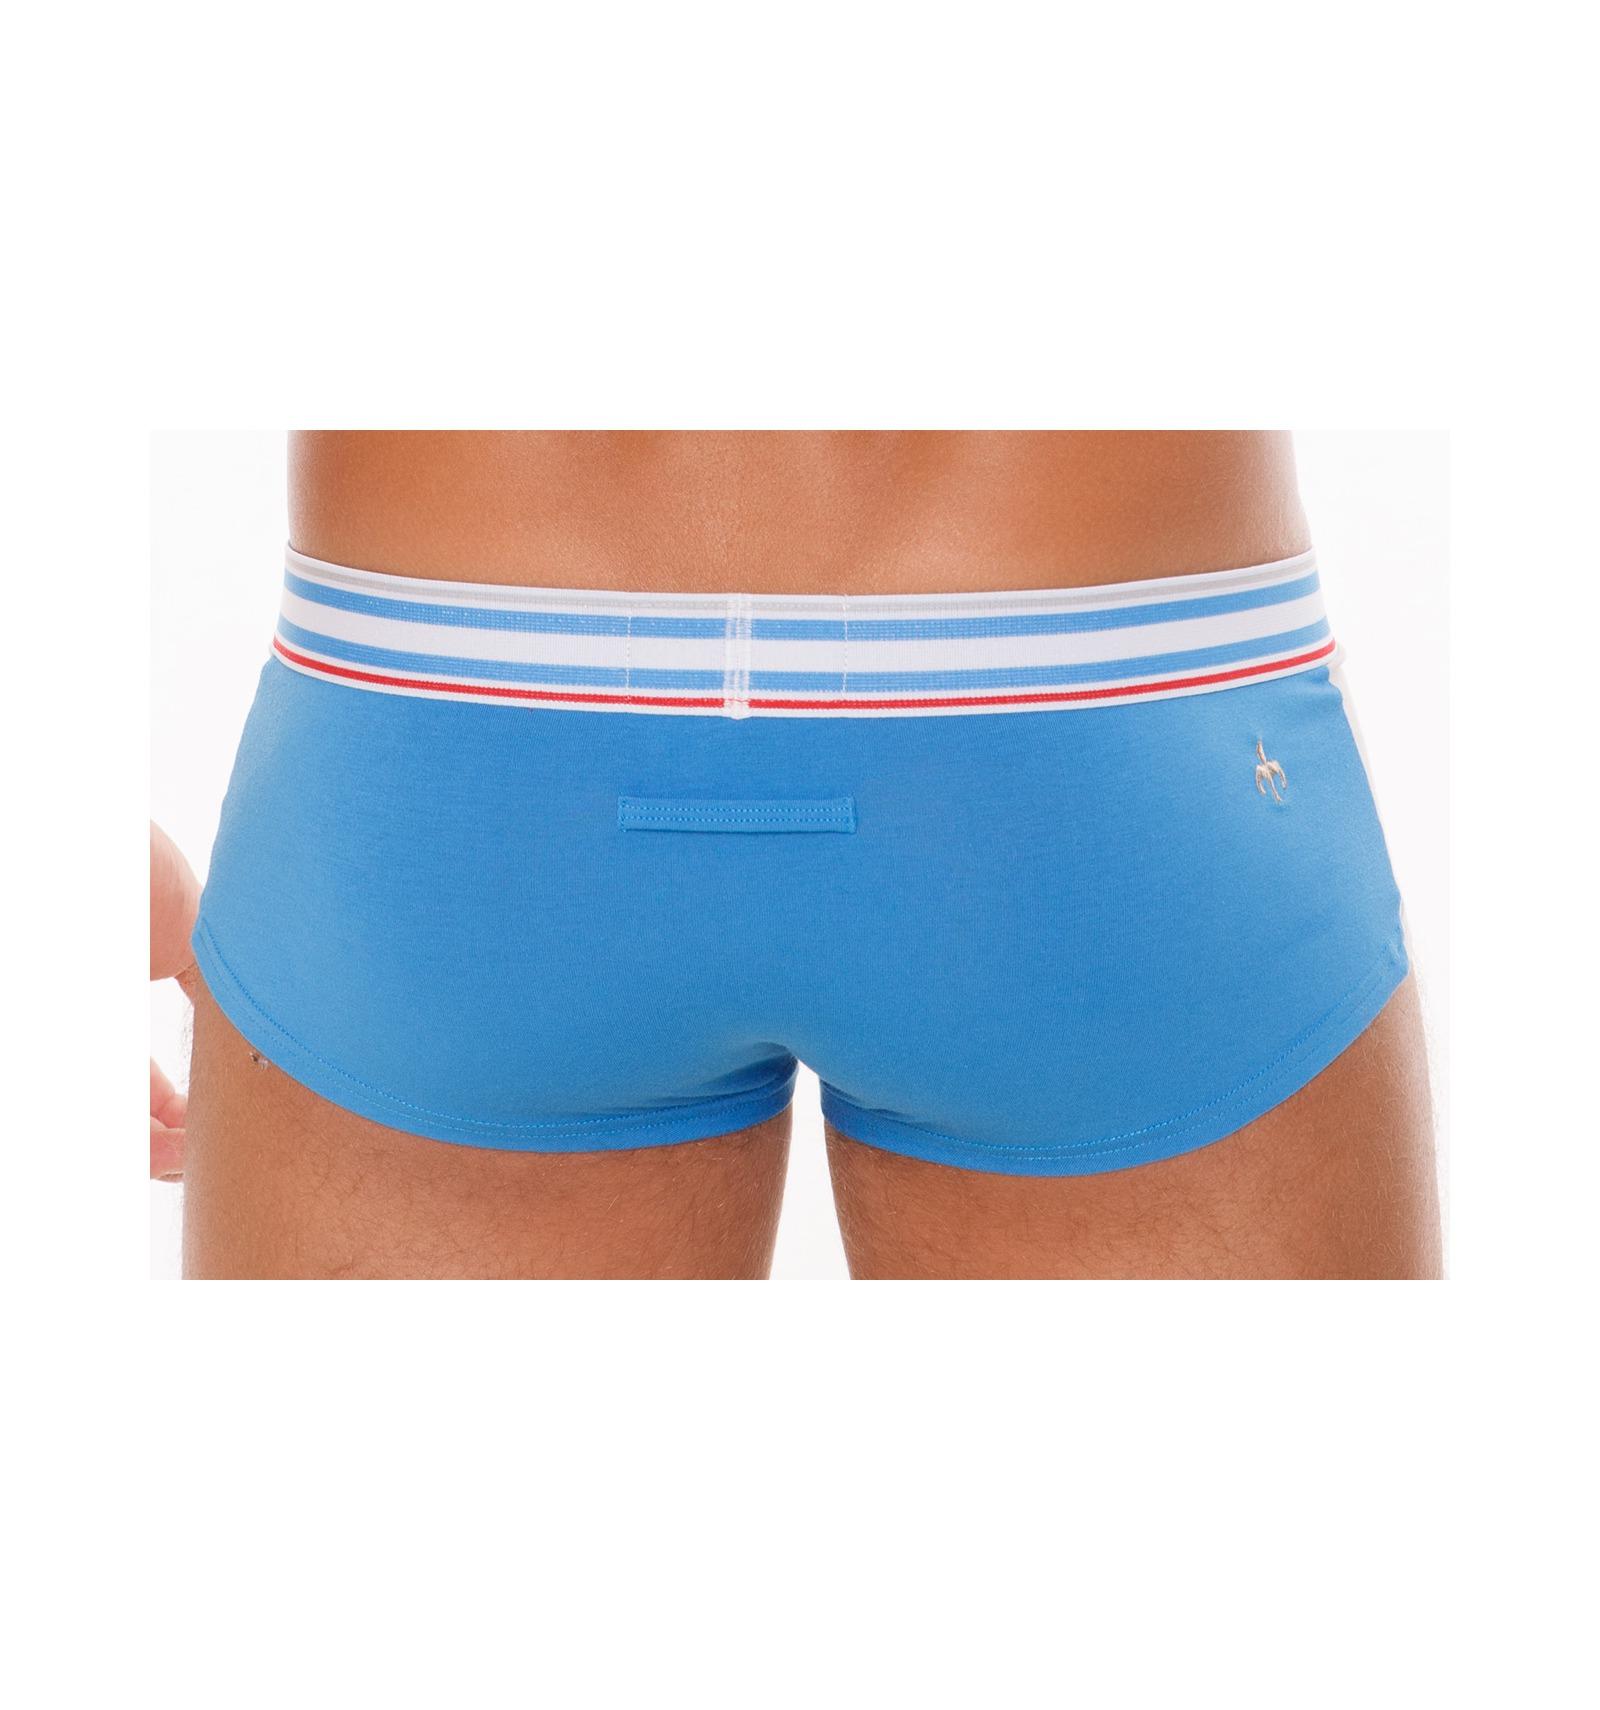 Marcuse Underwear Glory Boxer Blue/Grey